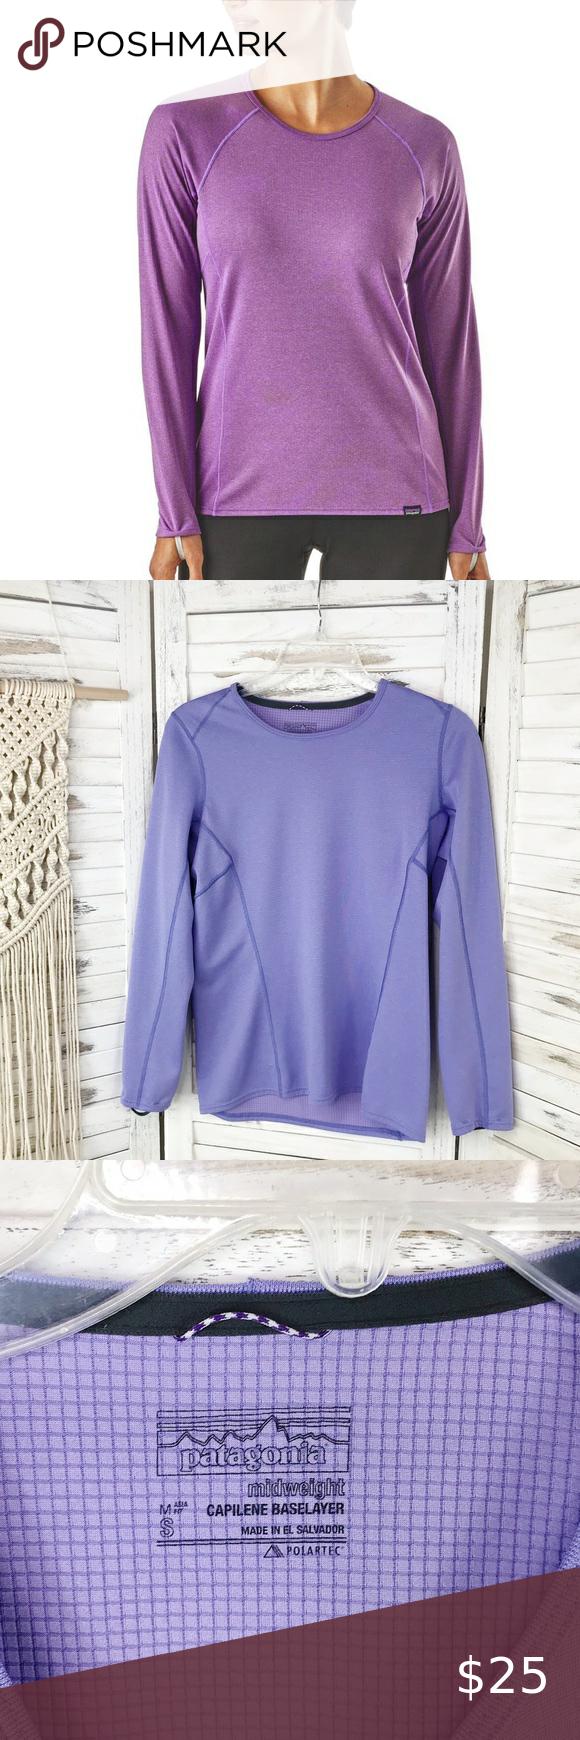 Patagonia Purple Capilene Baselayer Crew Neck S Layered Shirts Clothes Design Layered Long Sleeve [ 1740 x 580 Pixel ]